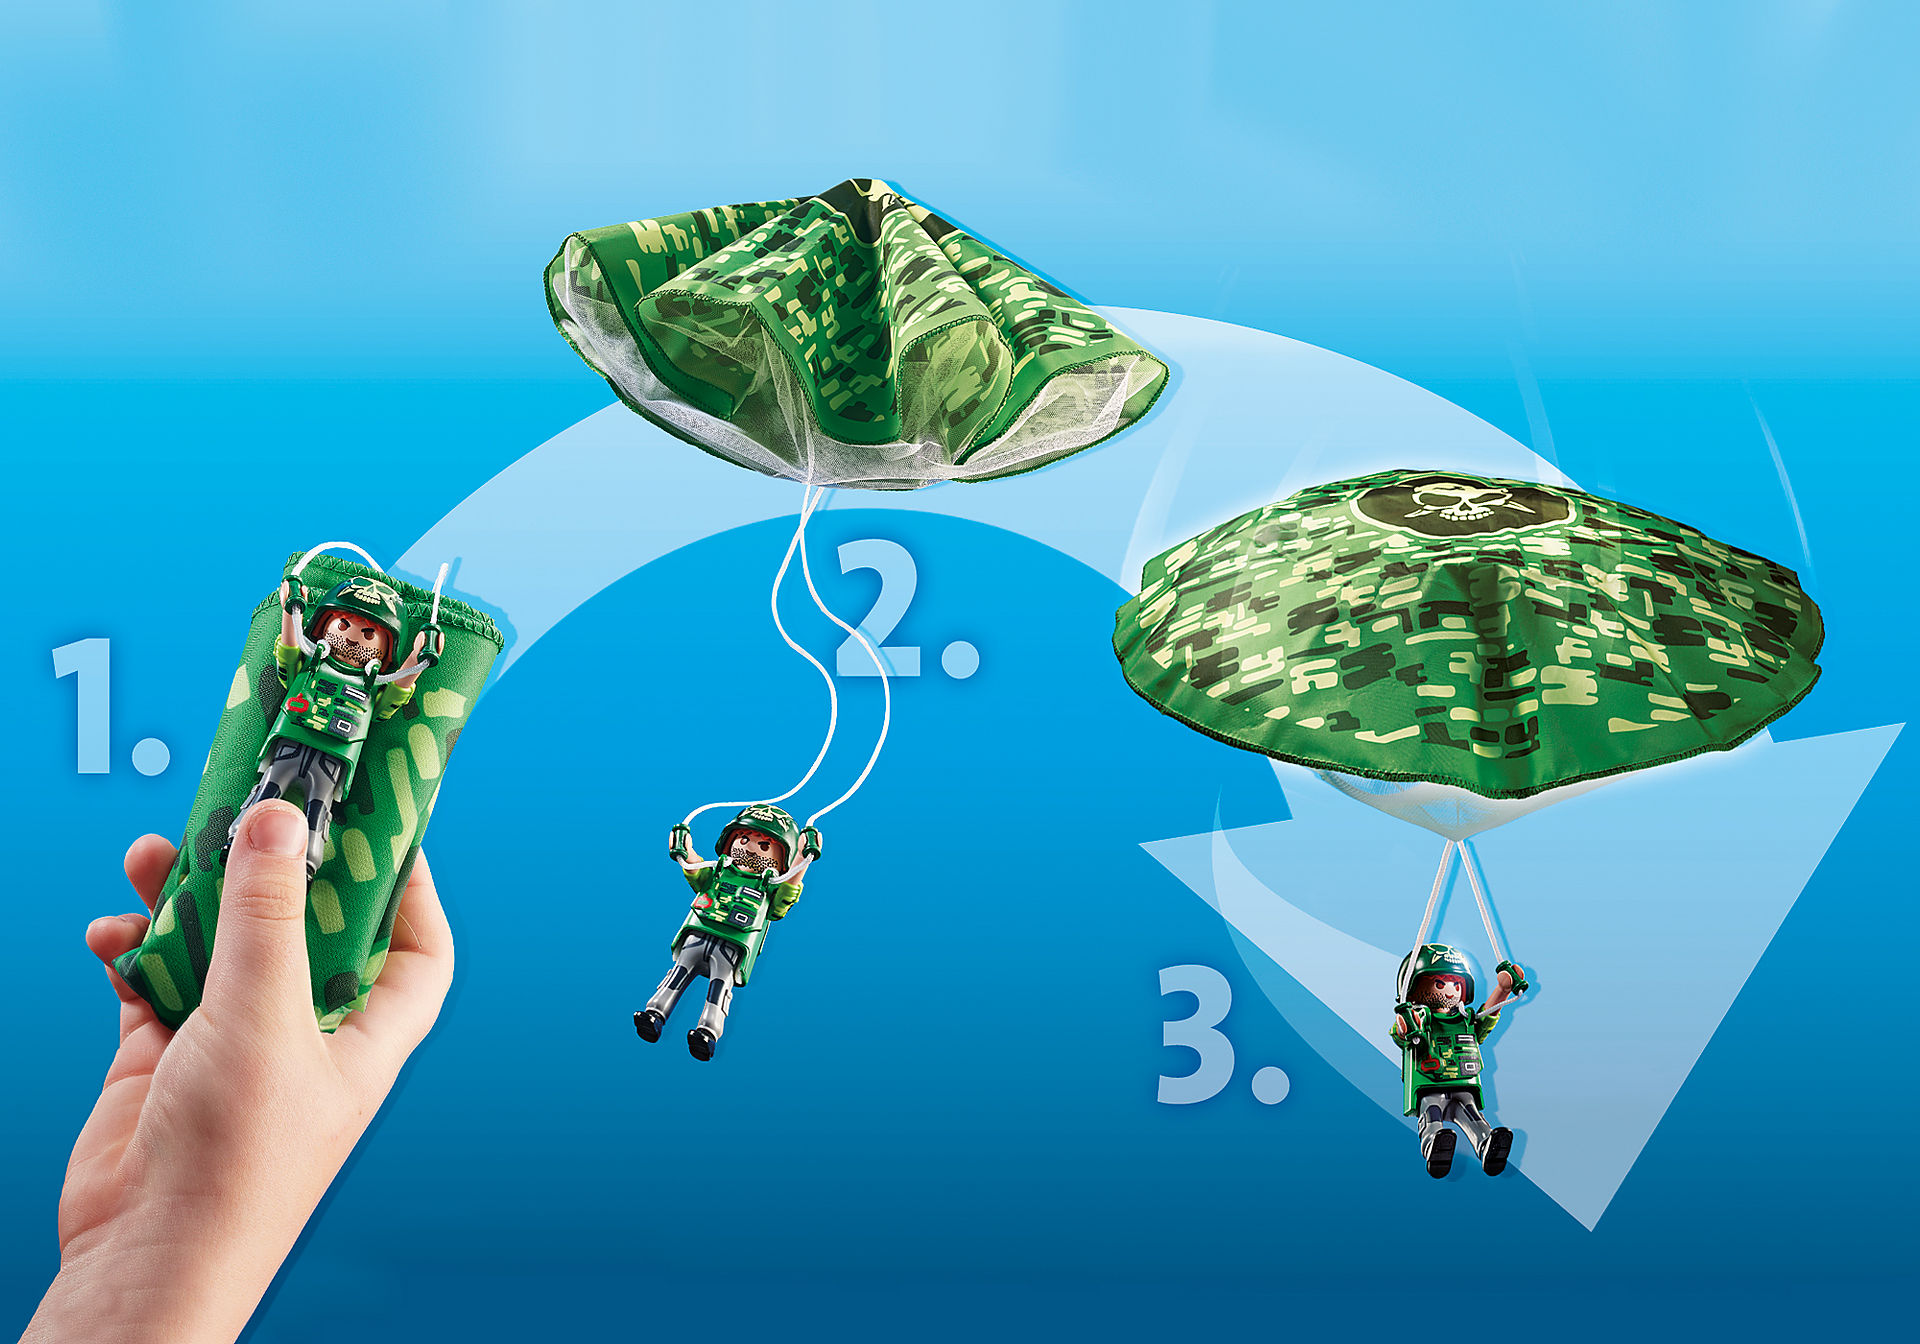 70569 Helicóptero de Policía: persecución en paracaídas zoom image5